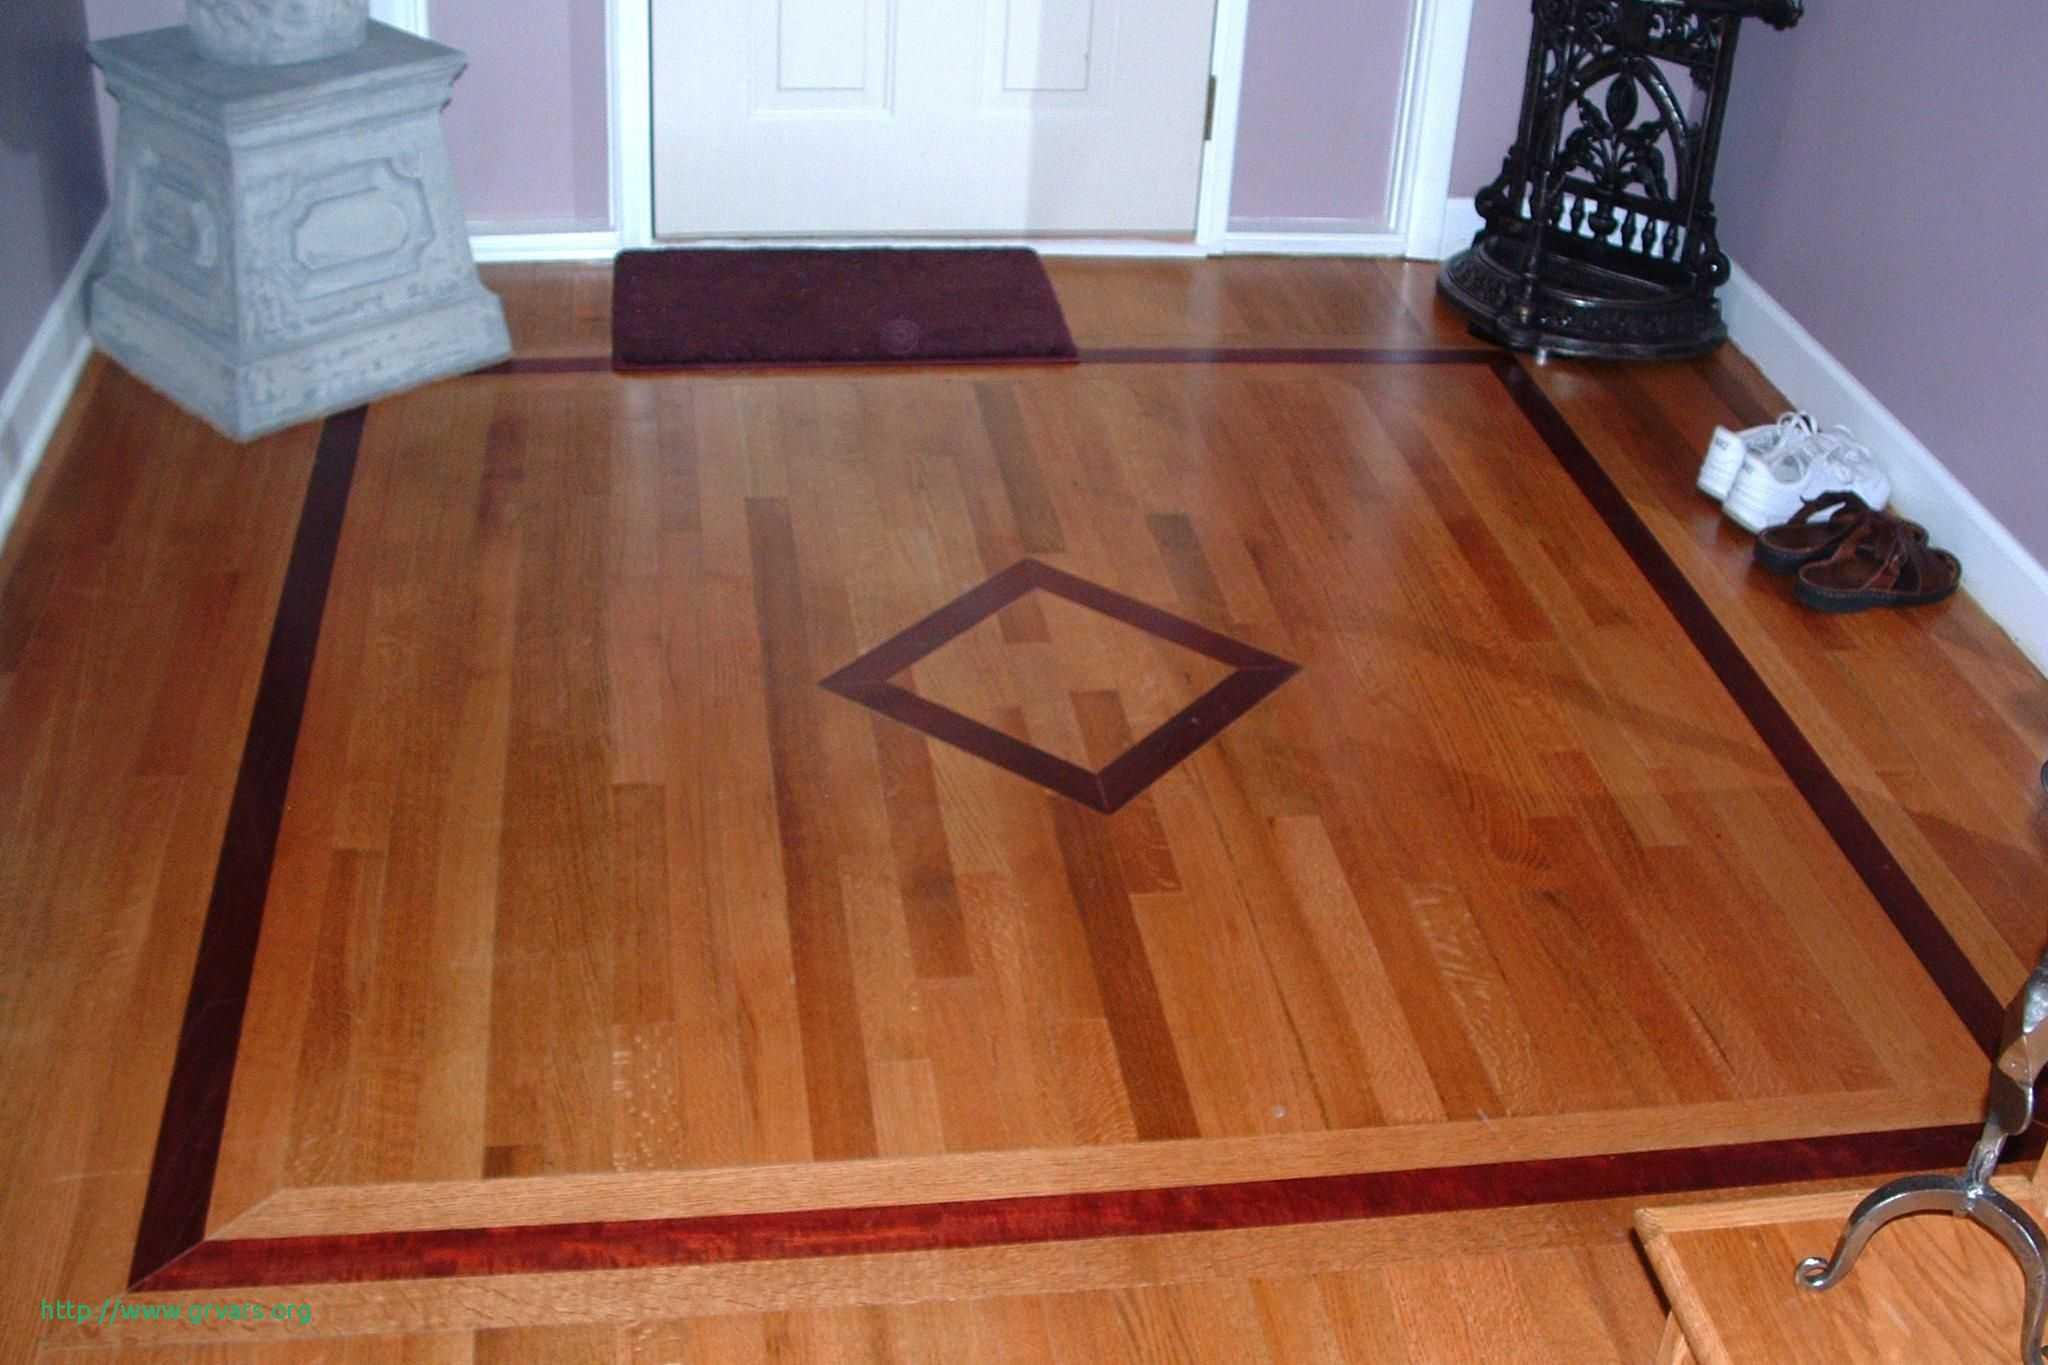 floating vs gluing hardwood floors of 23 unique wood floor glue with moisture barrier ideas blog regarding wood floor glue with moisture barrier unique hardwood floor concrete stairs